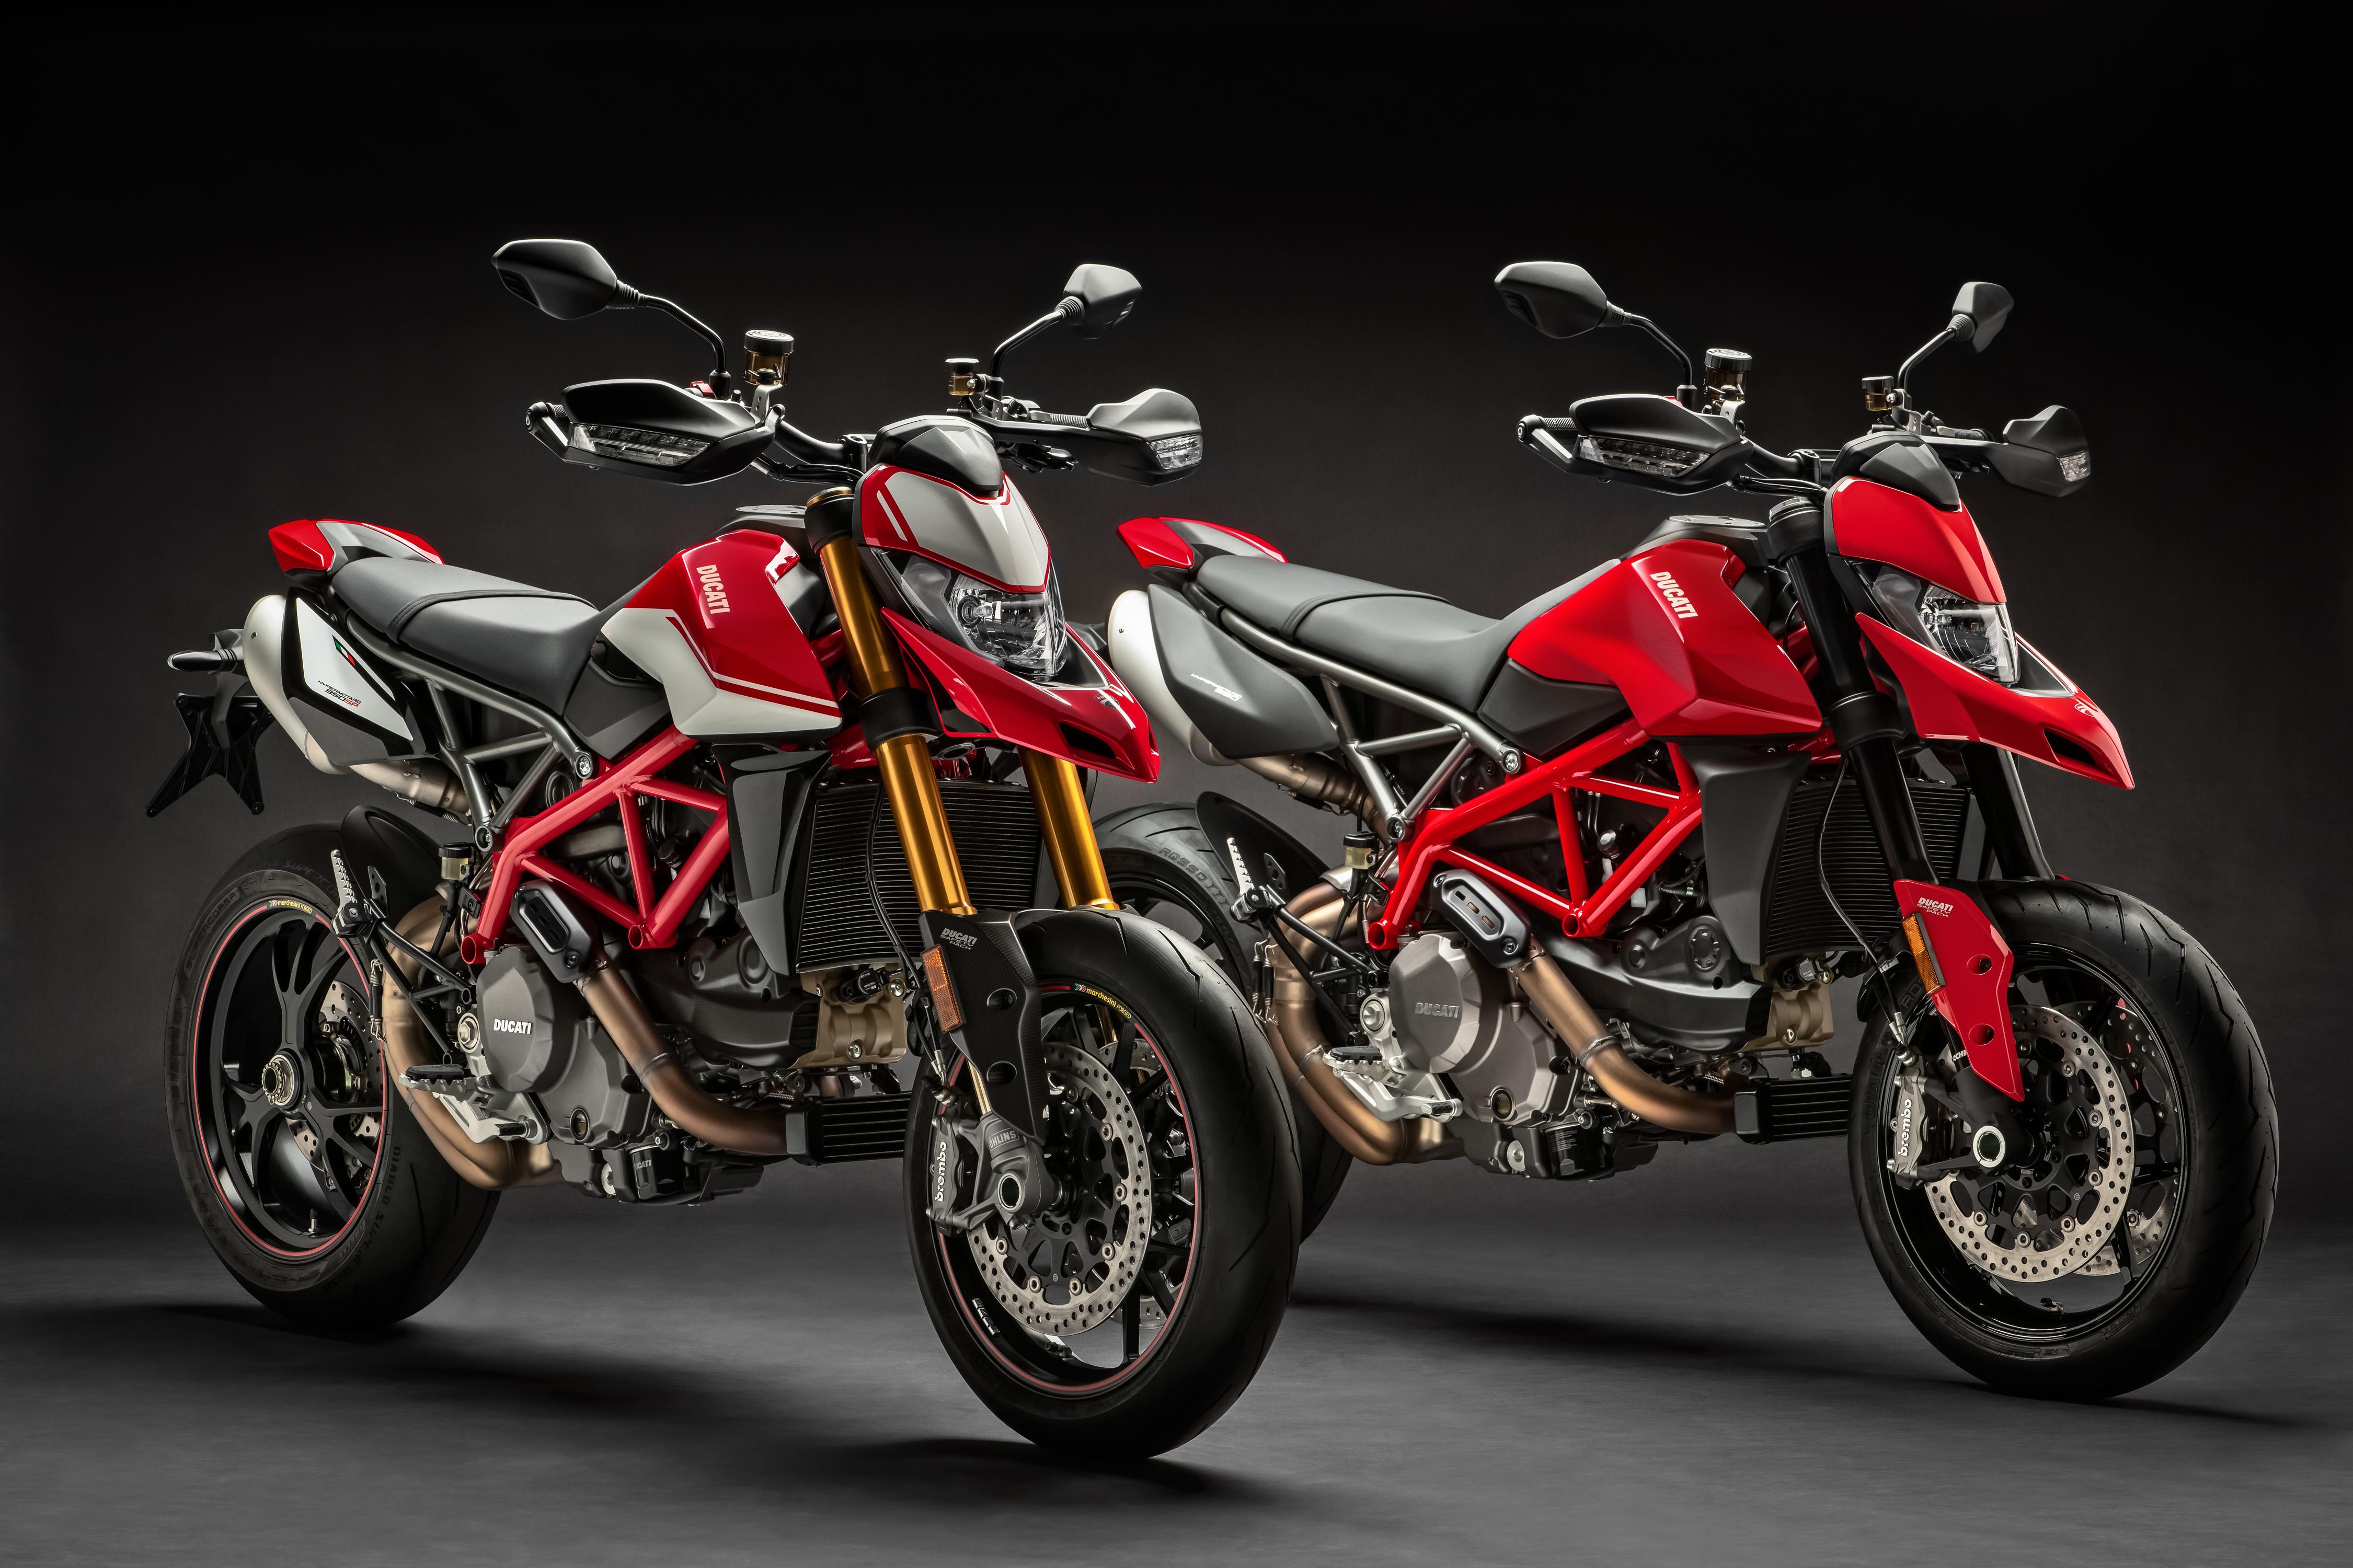 2019 Ducati Hypermotard 950